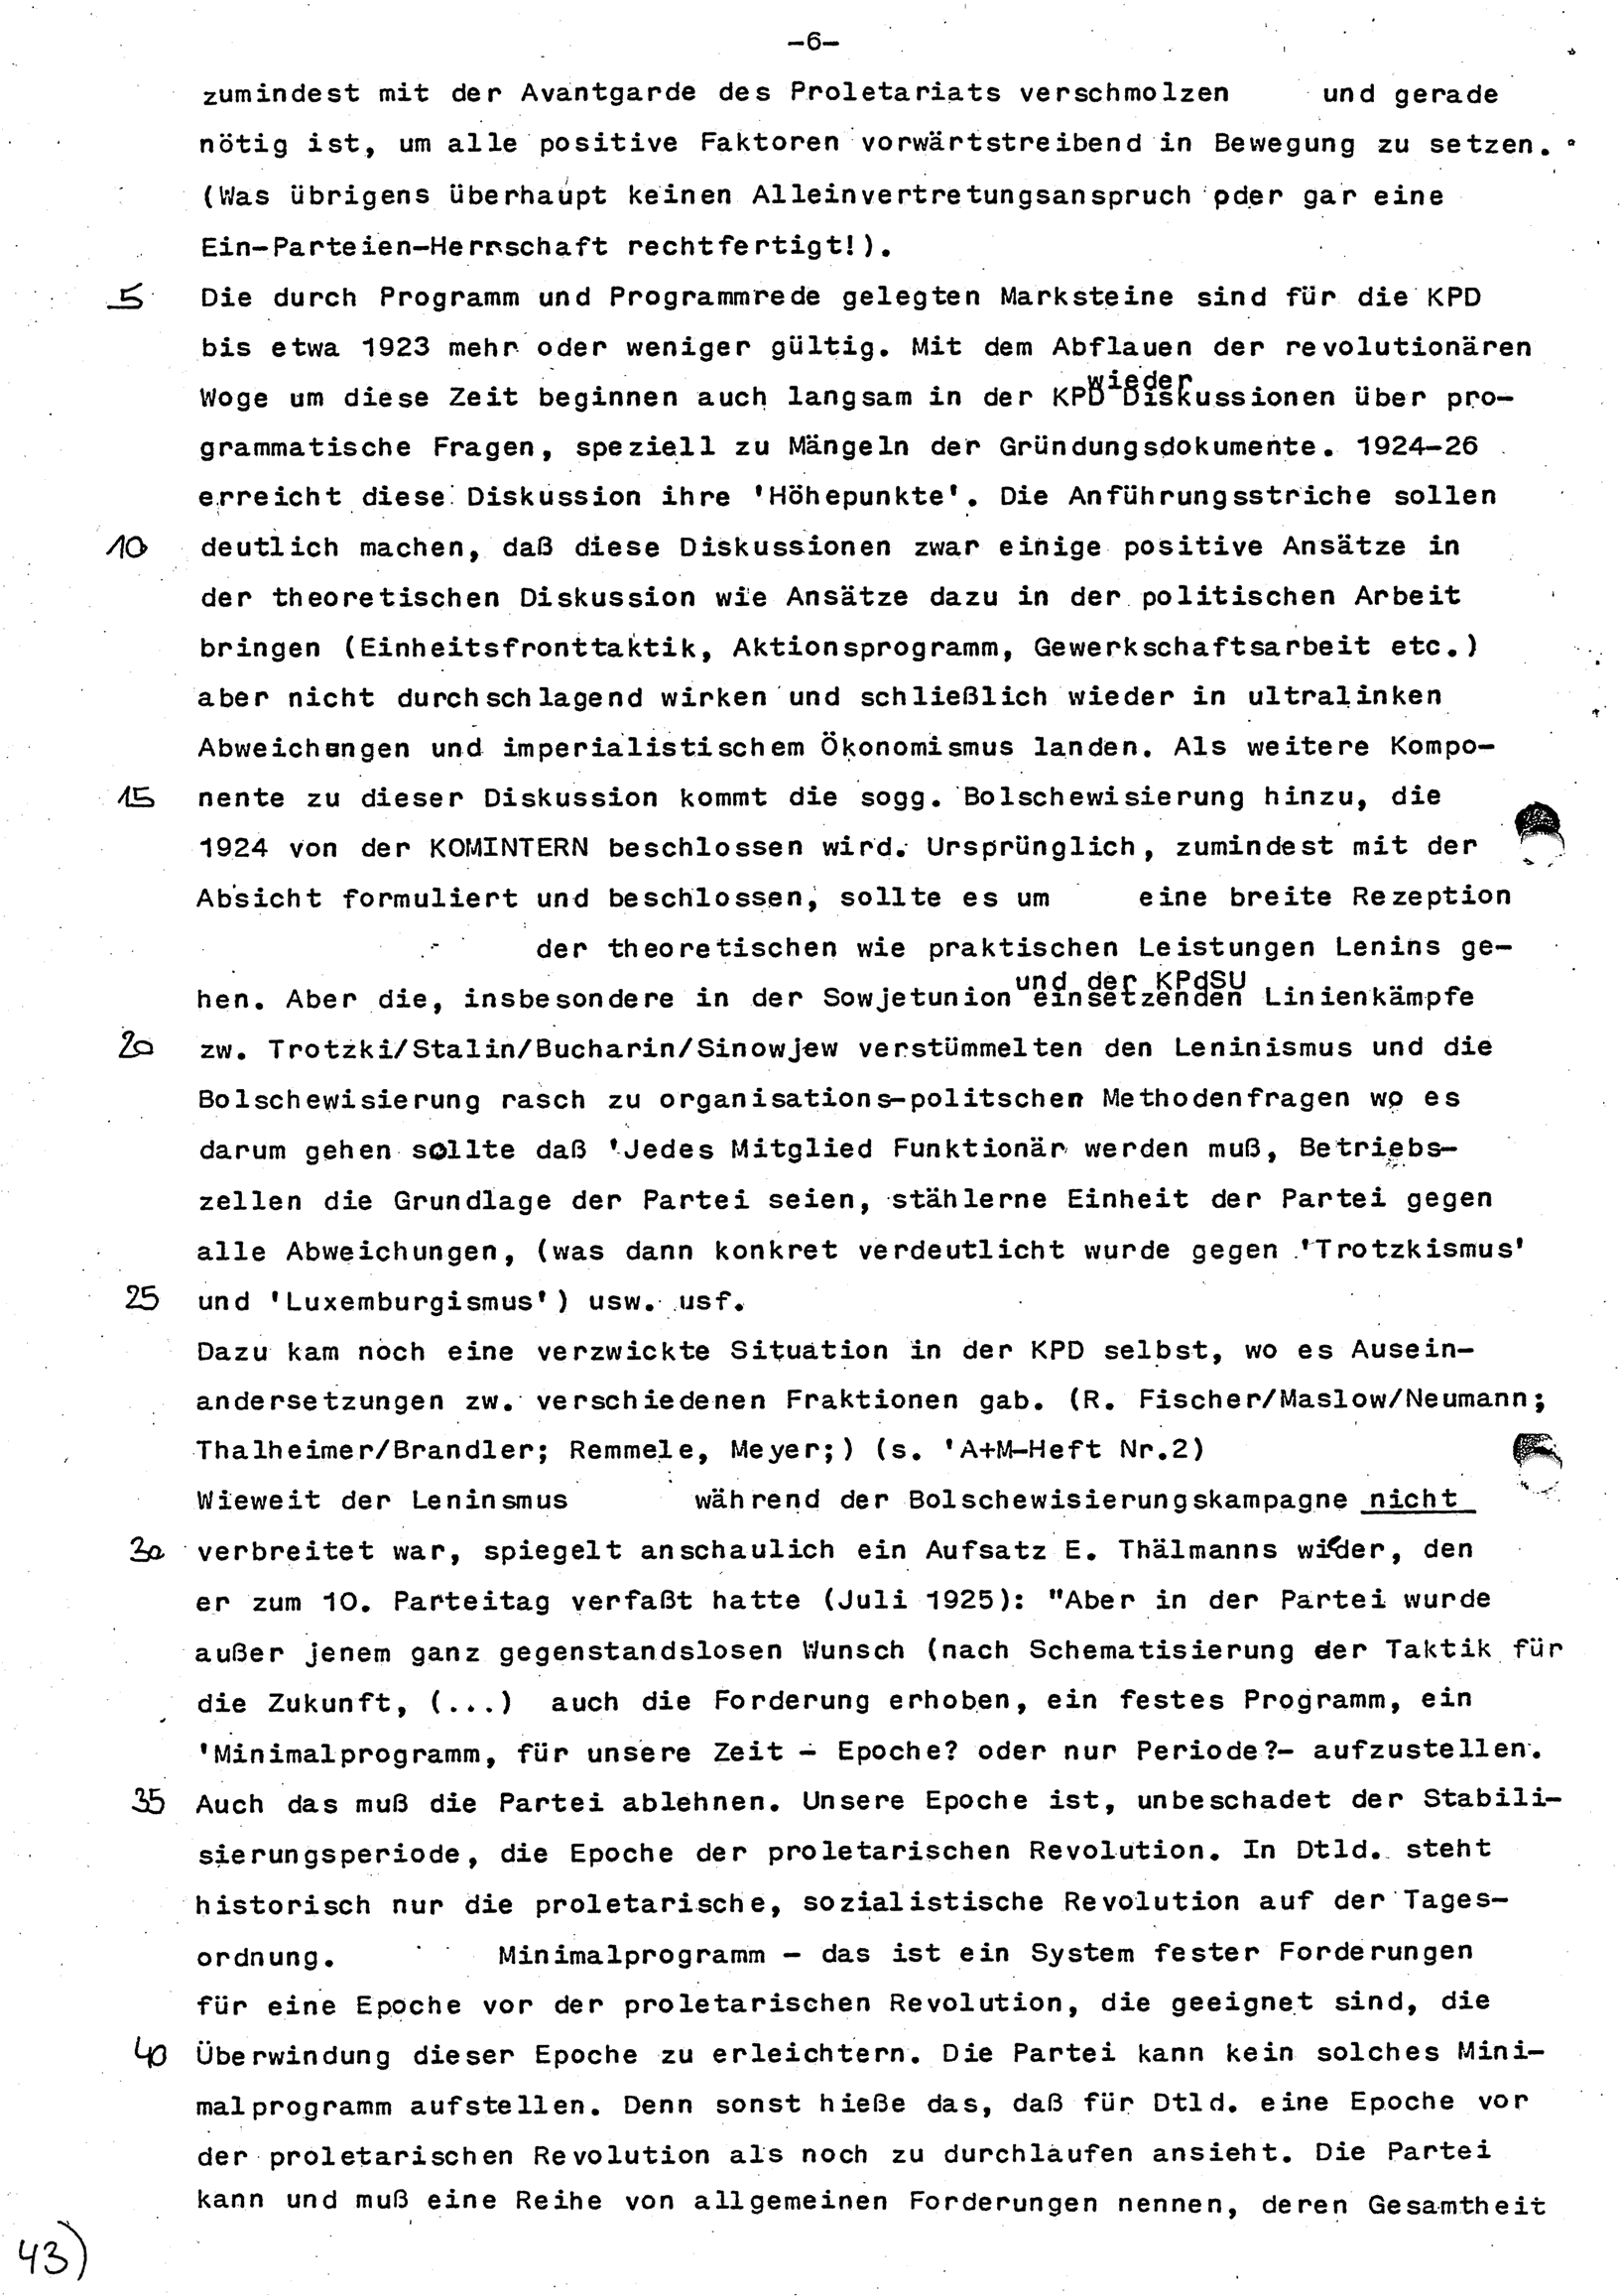 Ulm_KGU_Arbeitsheft_19830425_015_046